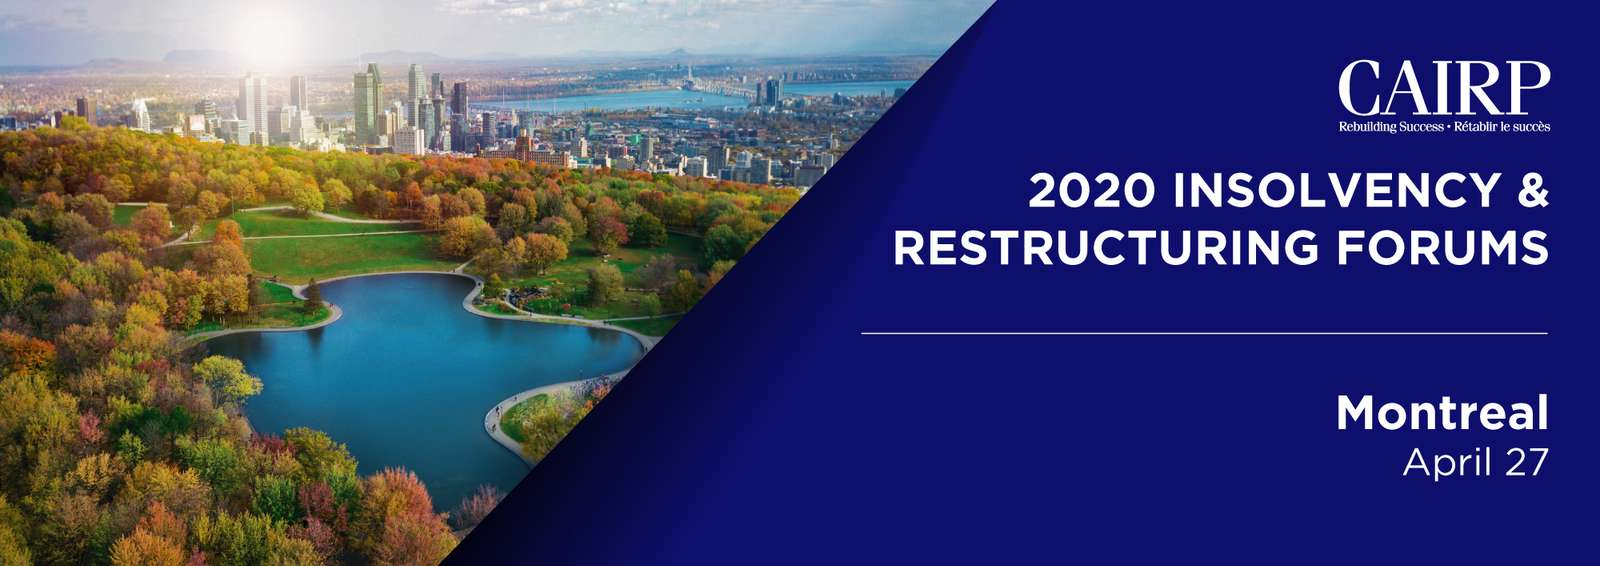 Forums_2020/1909386-Forums-Masthead-EN-Montreal.jpg